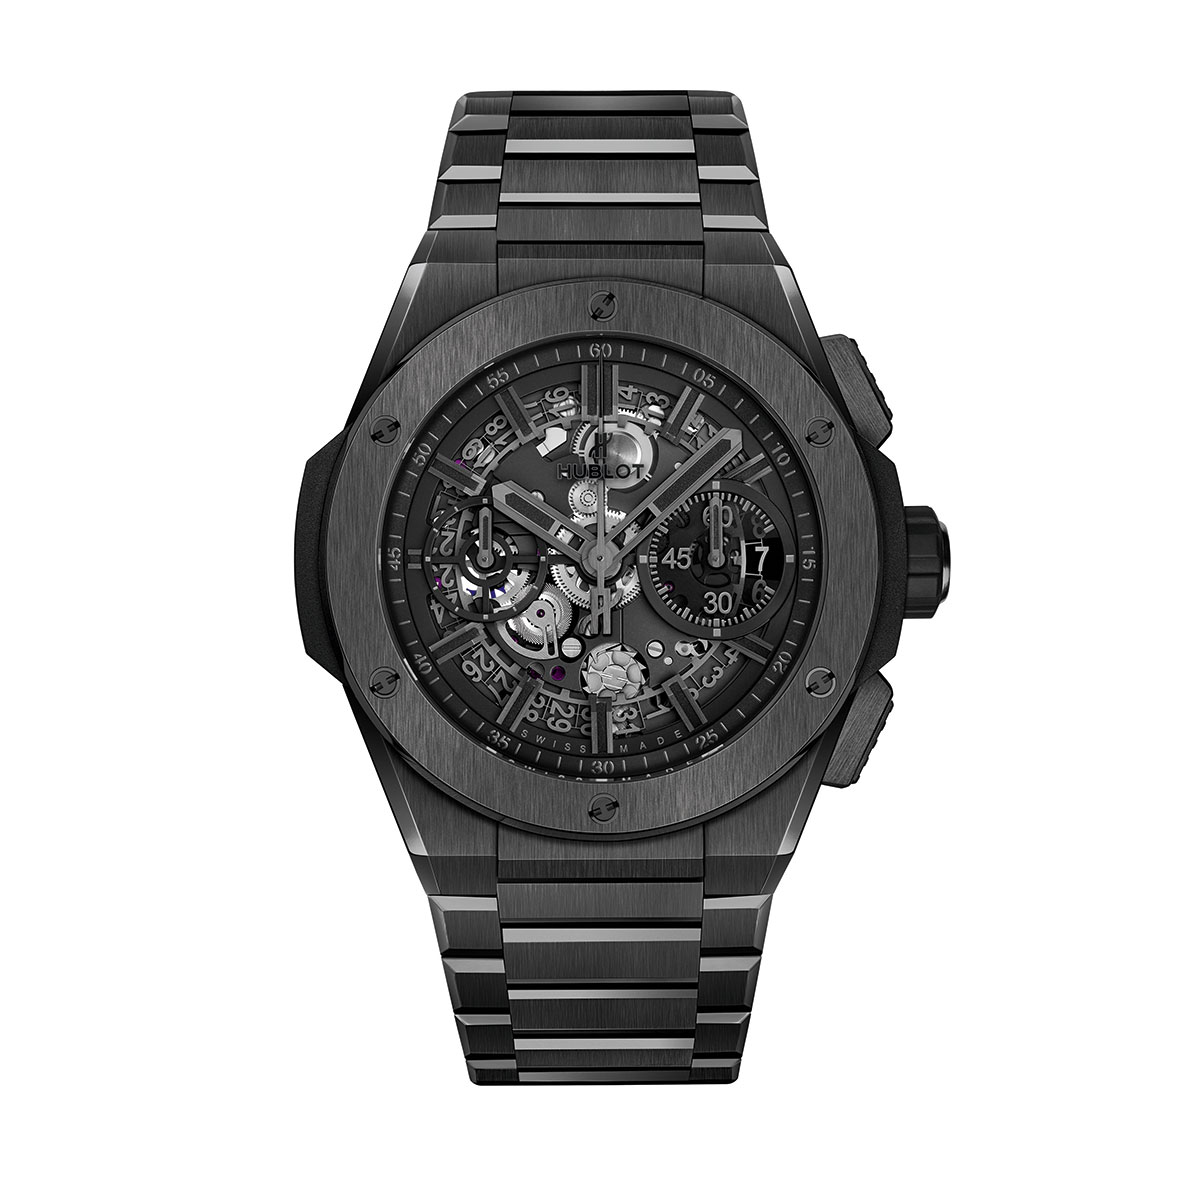 Hublot Big Bang Integral All Black 42mm Watch